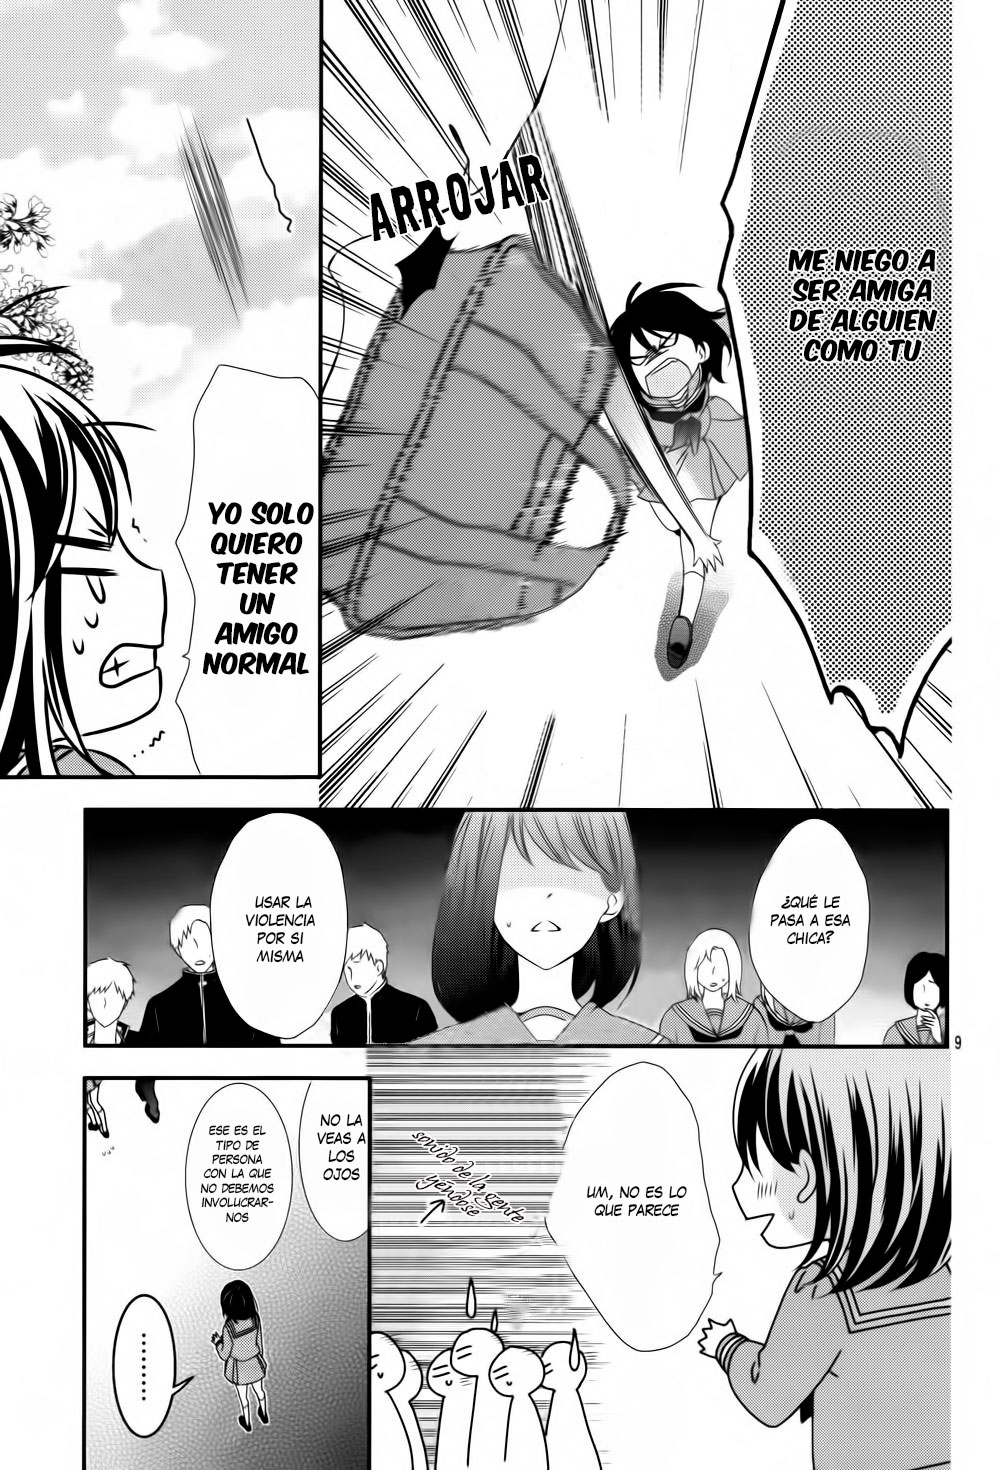 http://c5.ninemanga.com/es_manga/27/14875/363595/a53a1105001b87513d5ae6ccaa6a955d.jpg Page 8